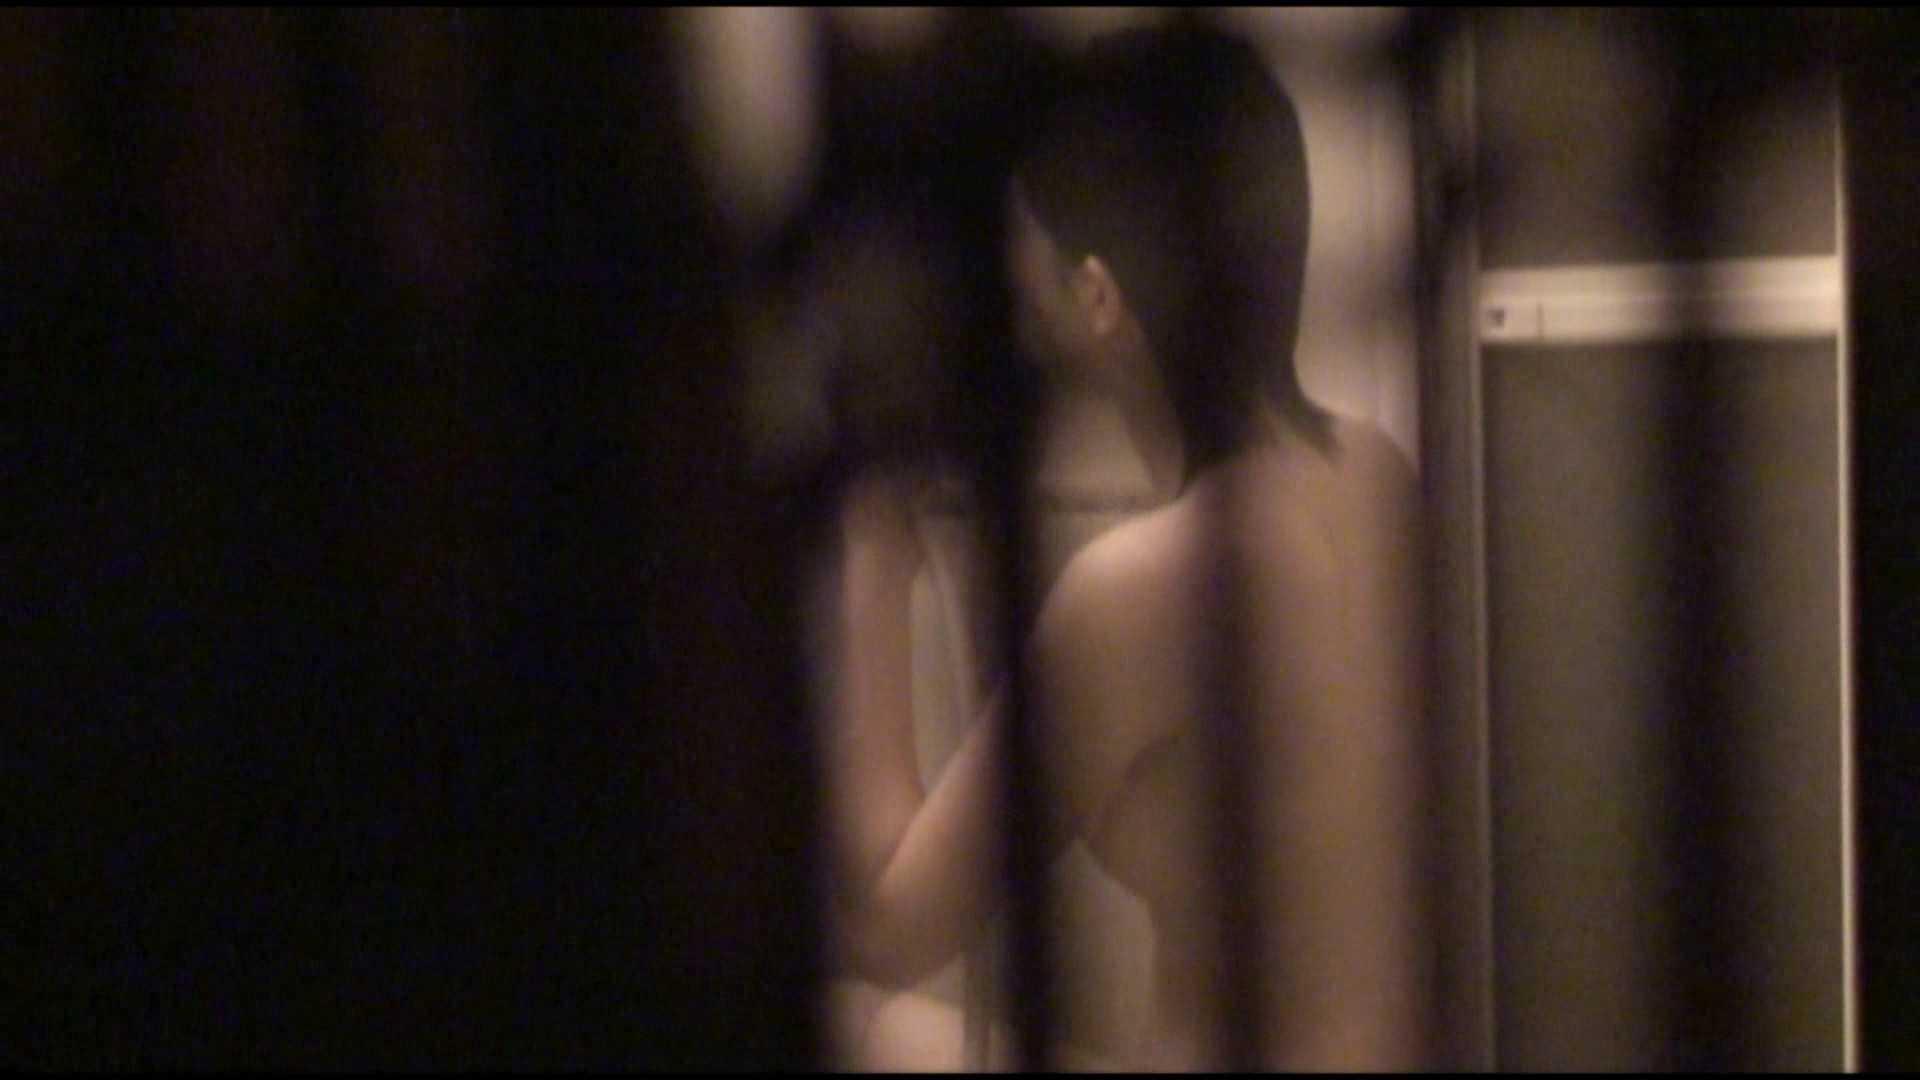 vol.05最高の極上美人!可愛い彼女の裸体をどうぞ!風呂上り鏡チェックも必見! 美人  68pic 59